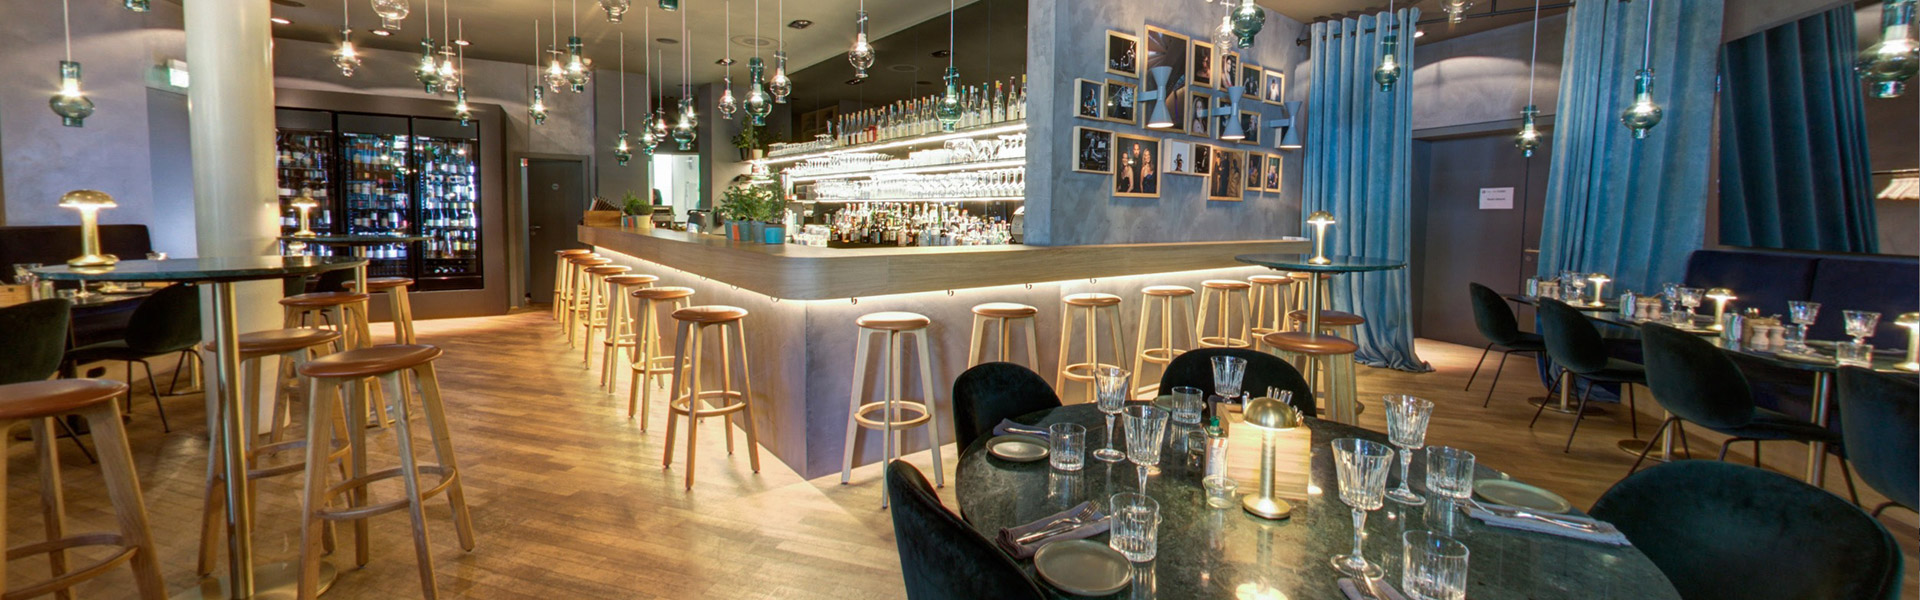 Restaurant Tempo bar ou manger